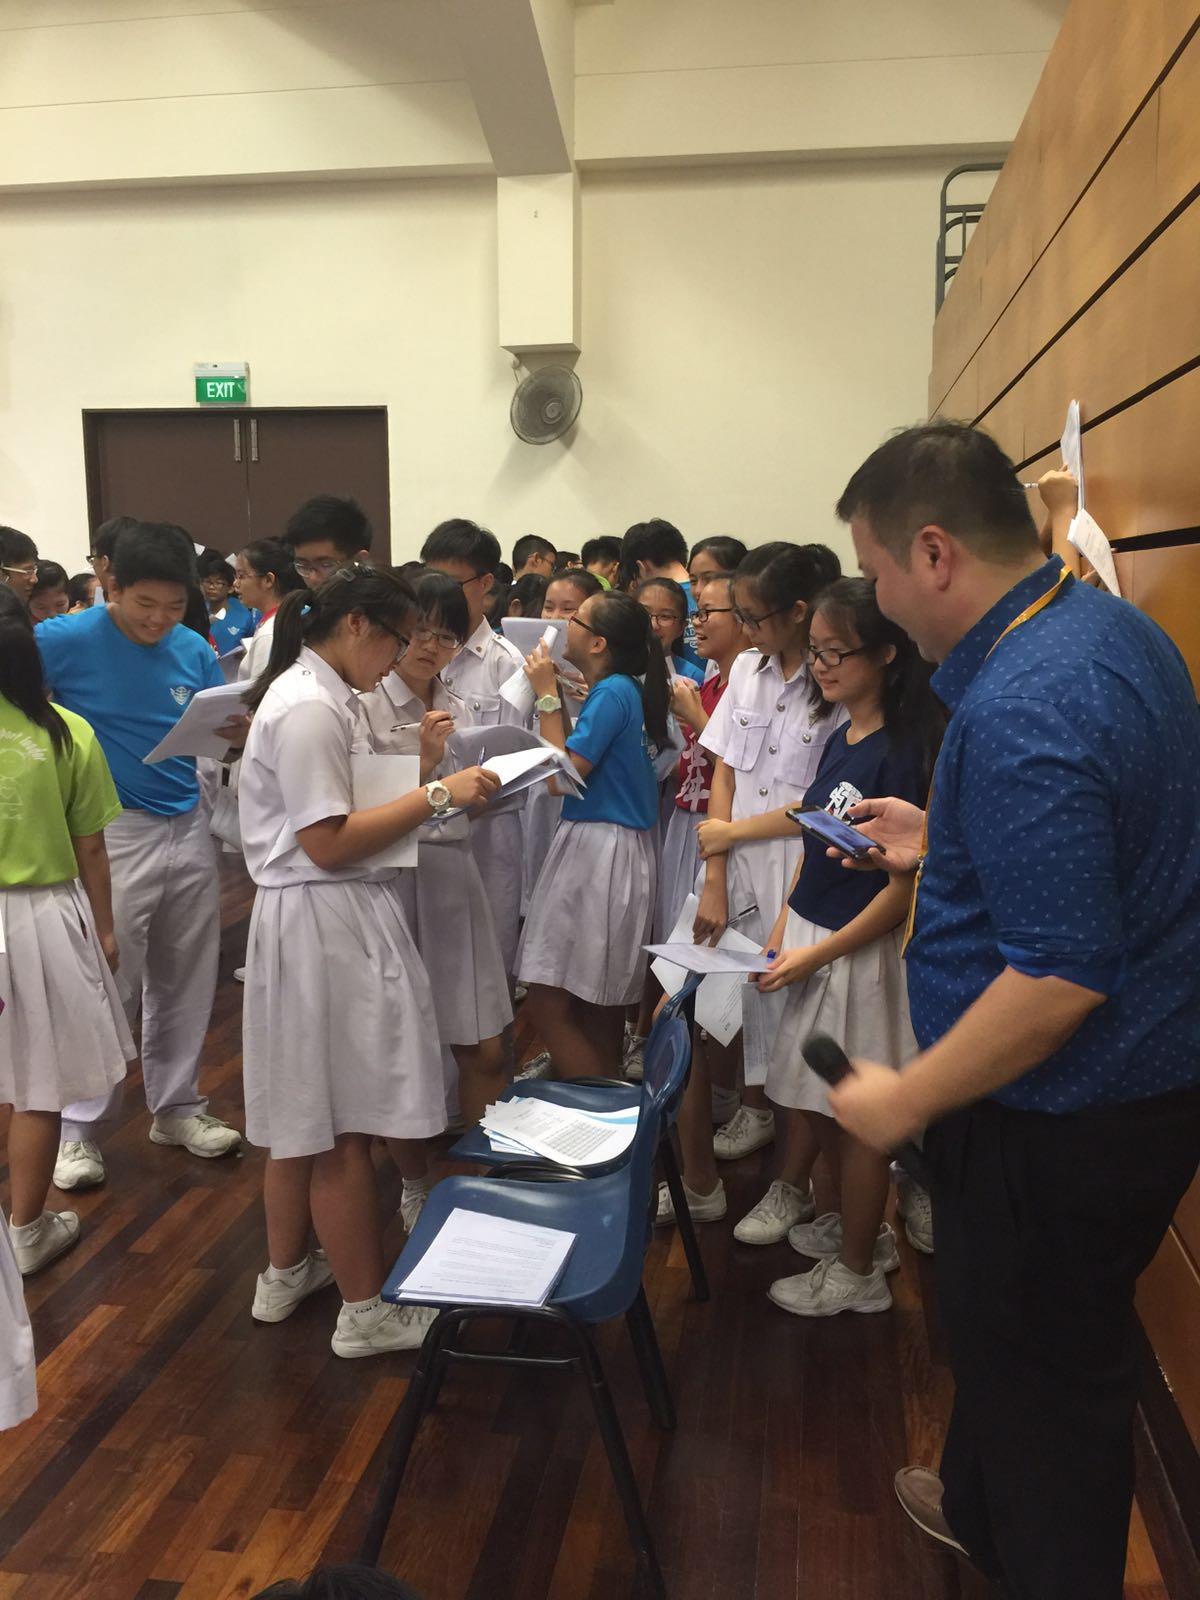 Students investigating a notorious YouTuber. (Chung Cheng High (Yishun))